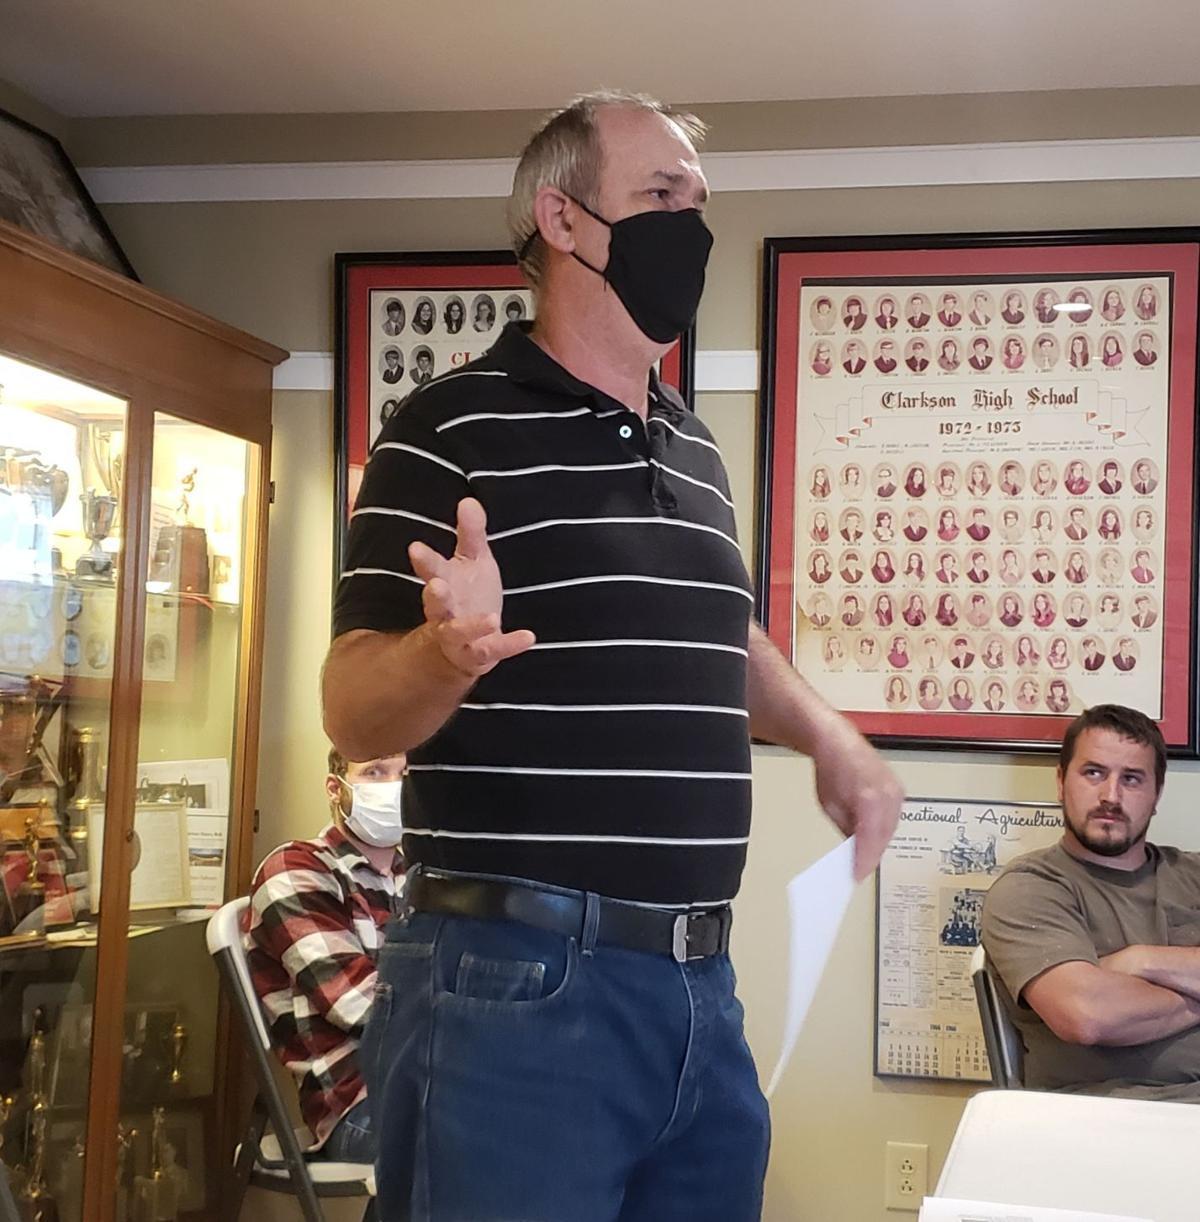 VFW to build memorial in Clarkson 1